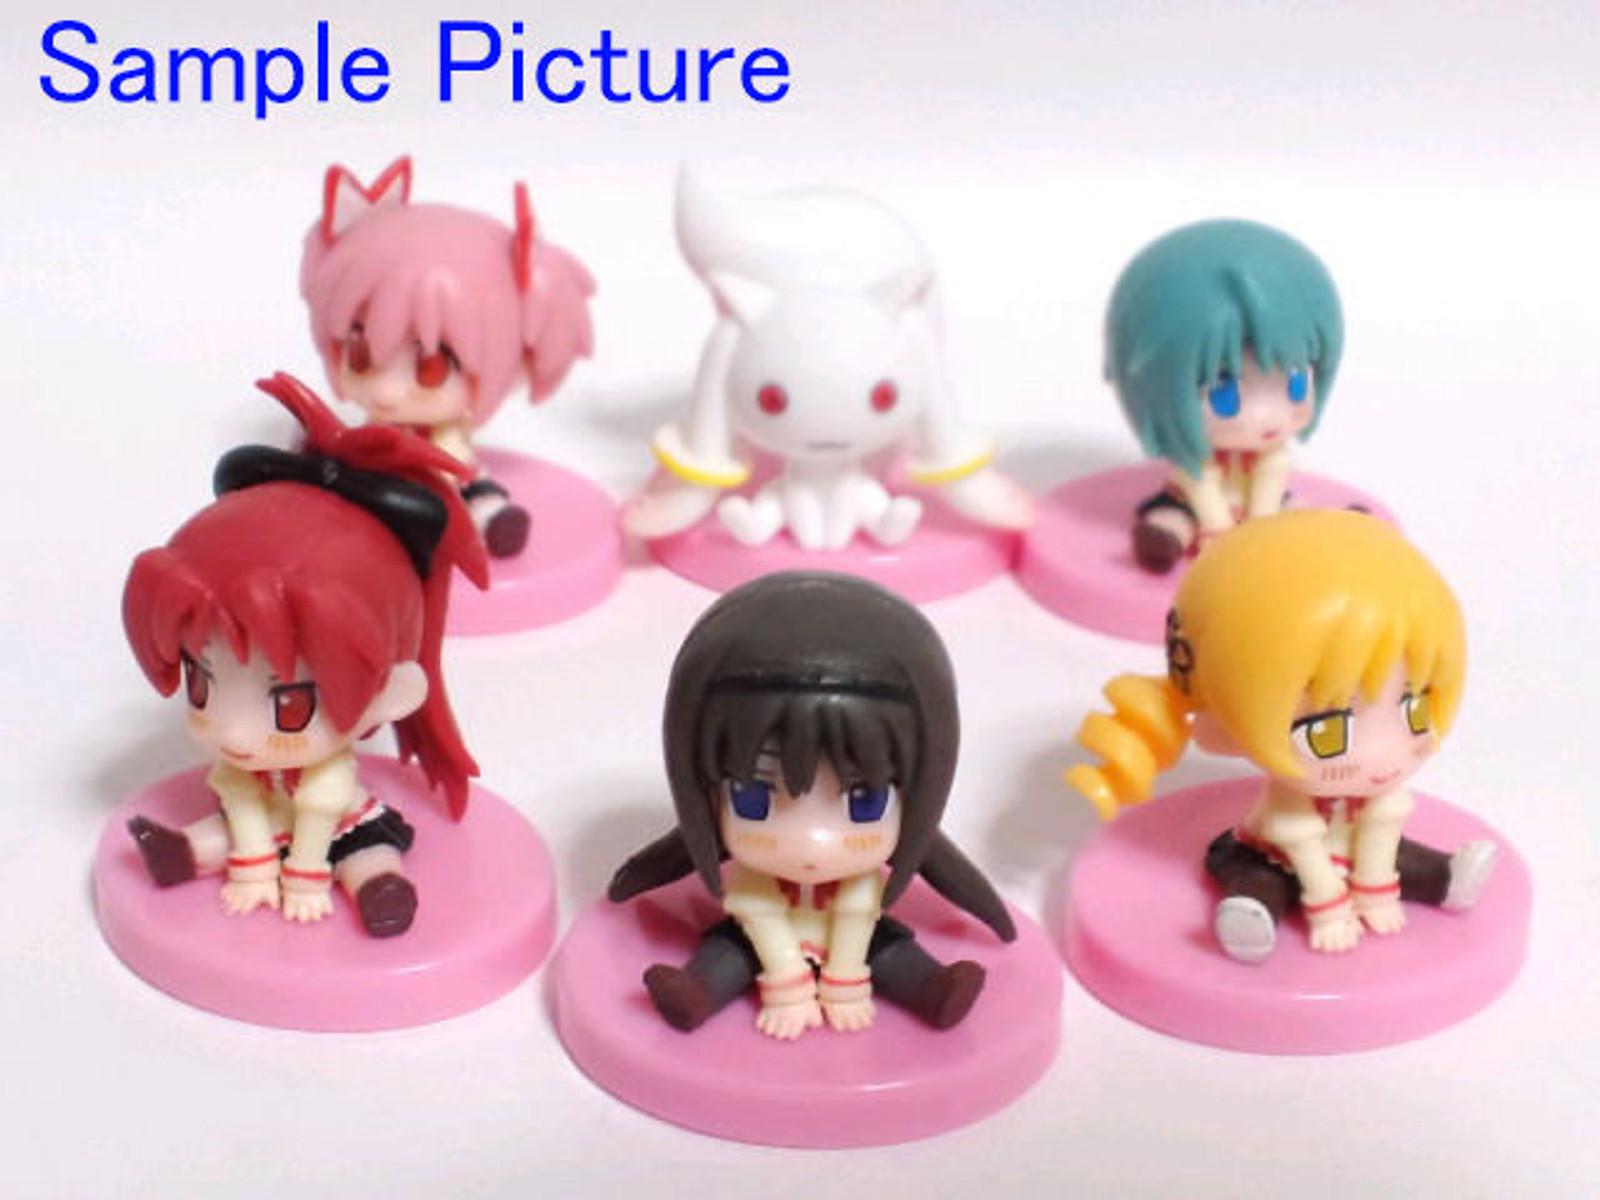 Set of 6 Puella Magi madoka Magica Mini Figure Lawson Limited JAPAN ANIME